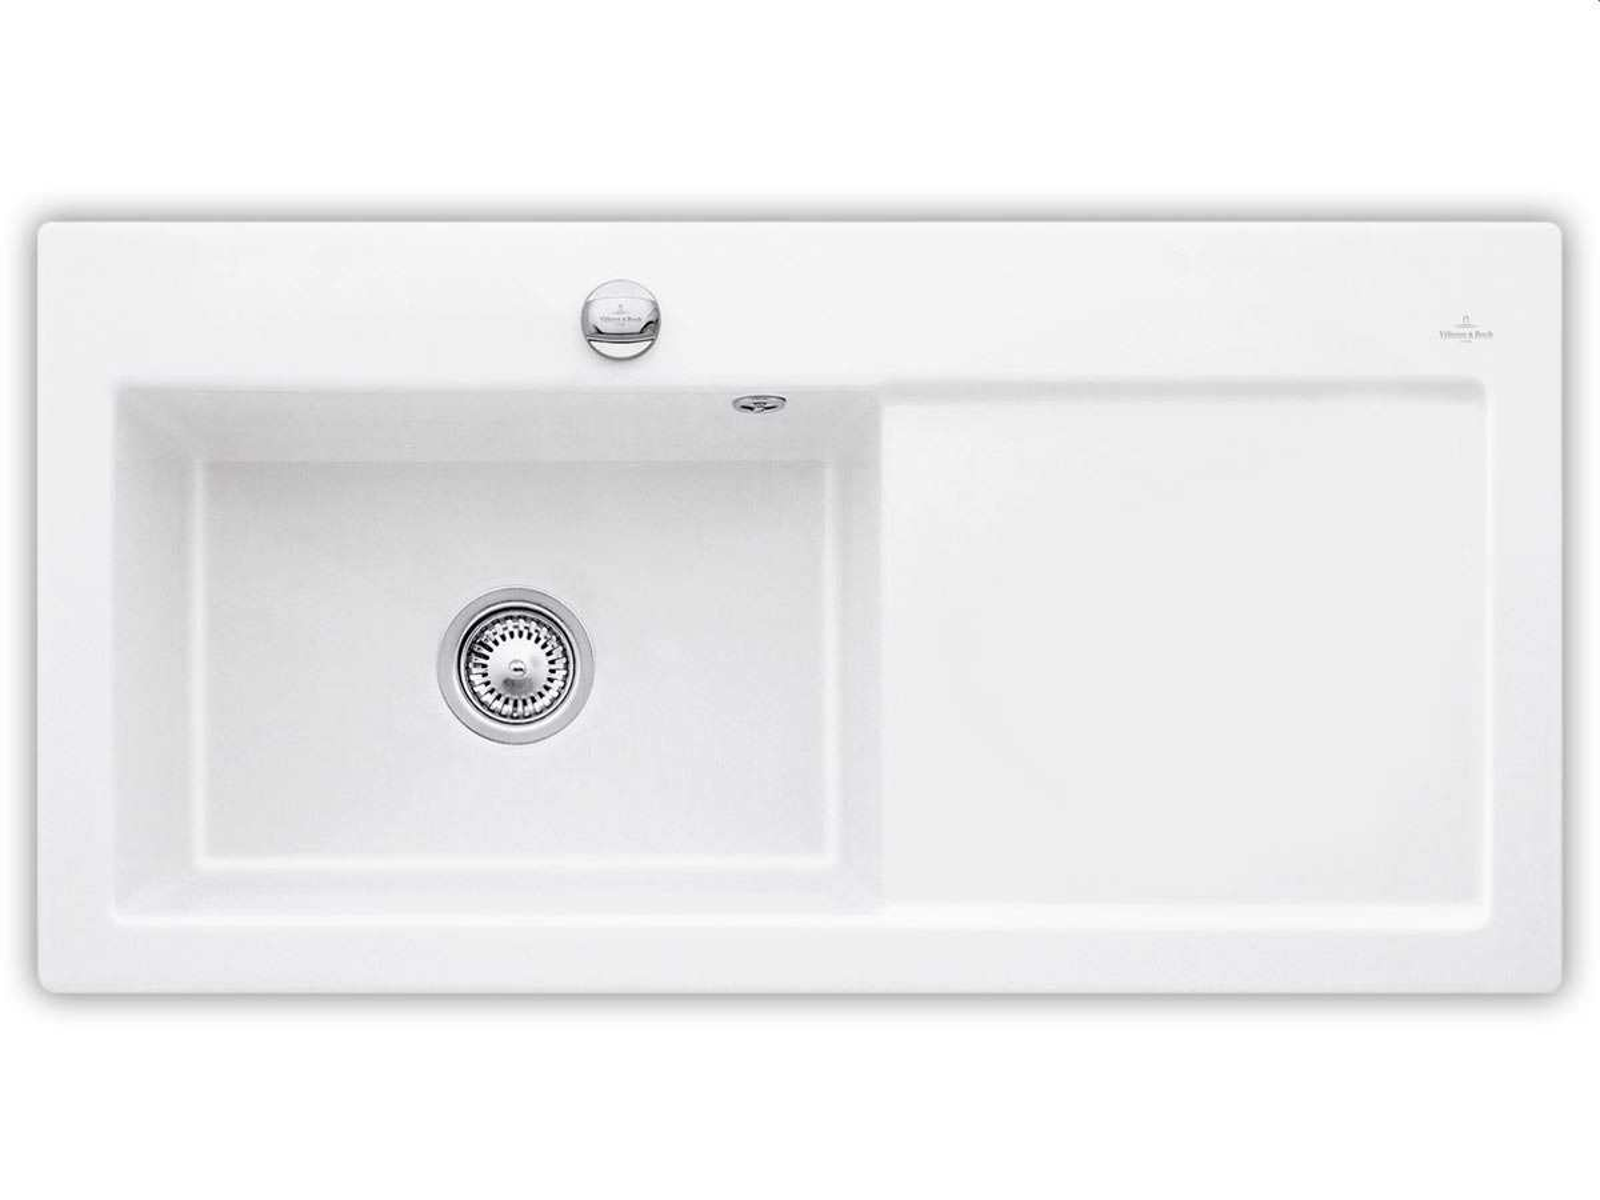 Villeroy & Boch Subway 60 XL Weiß (alpin) - 6718 02 R1 Keramikspüle Exzenterbetätigung